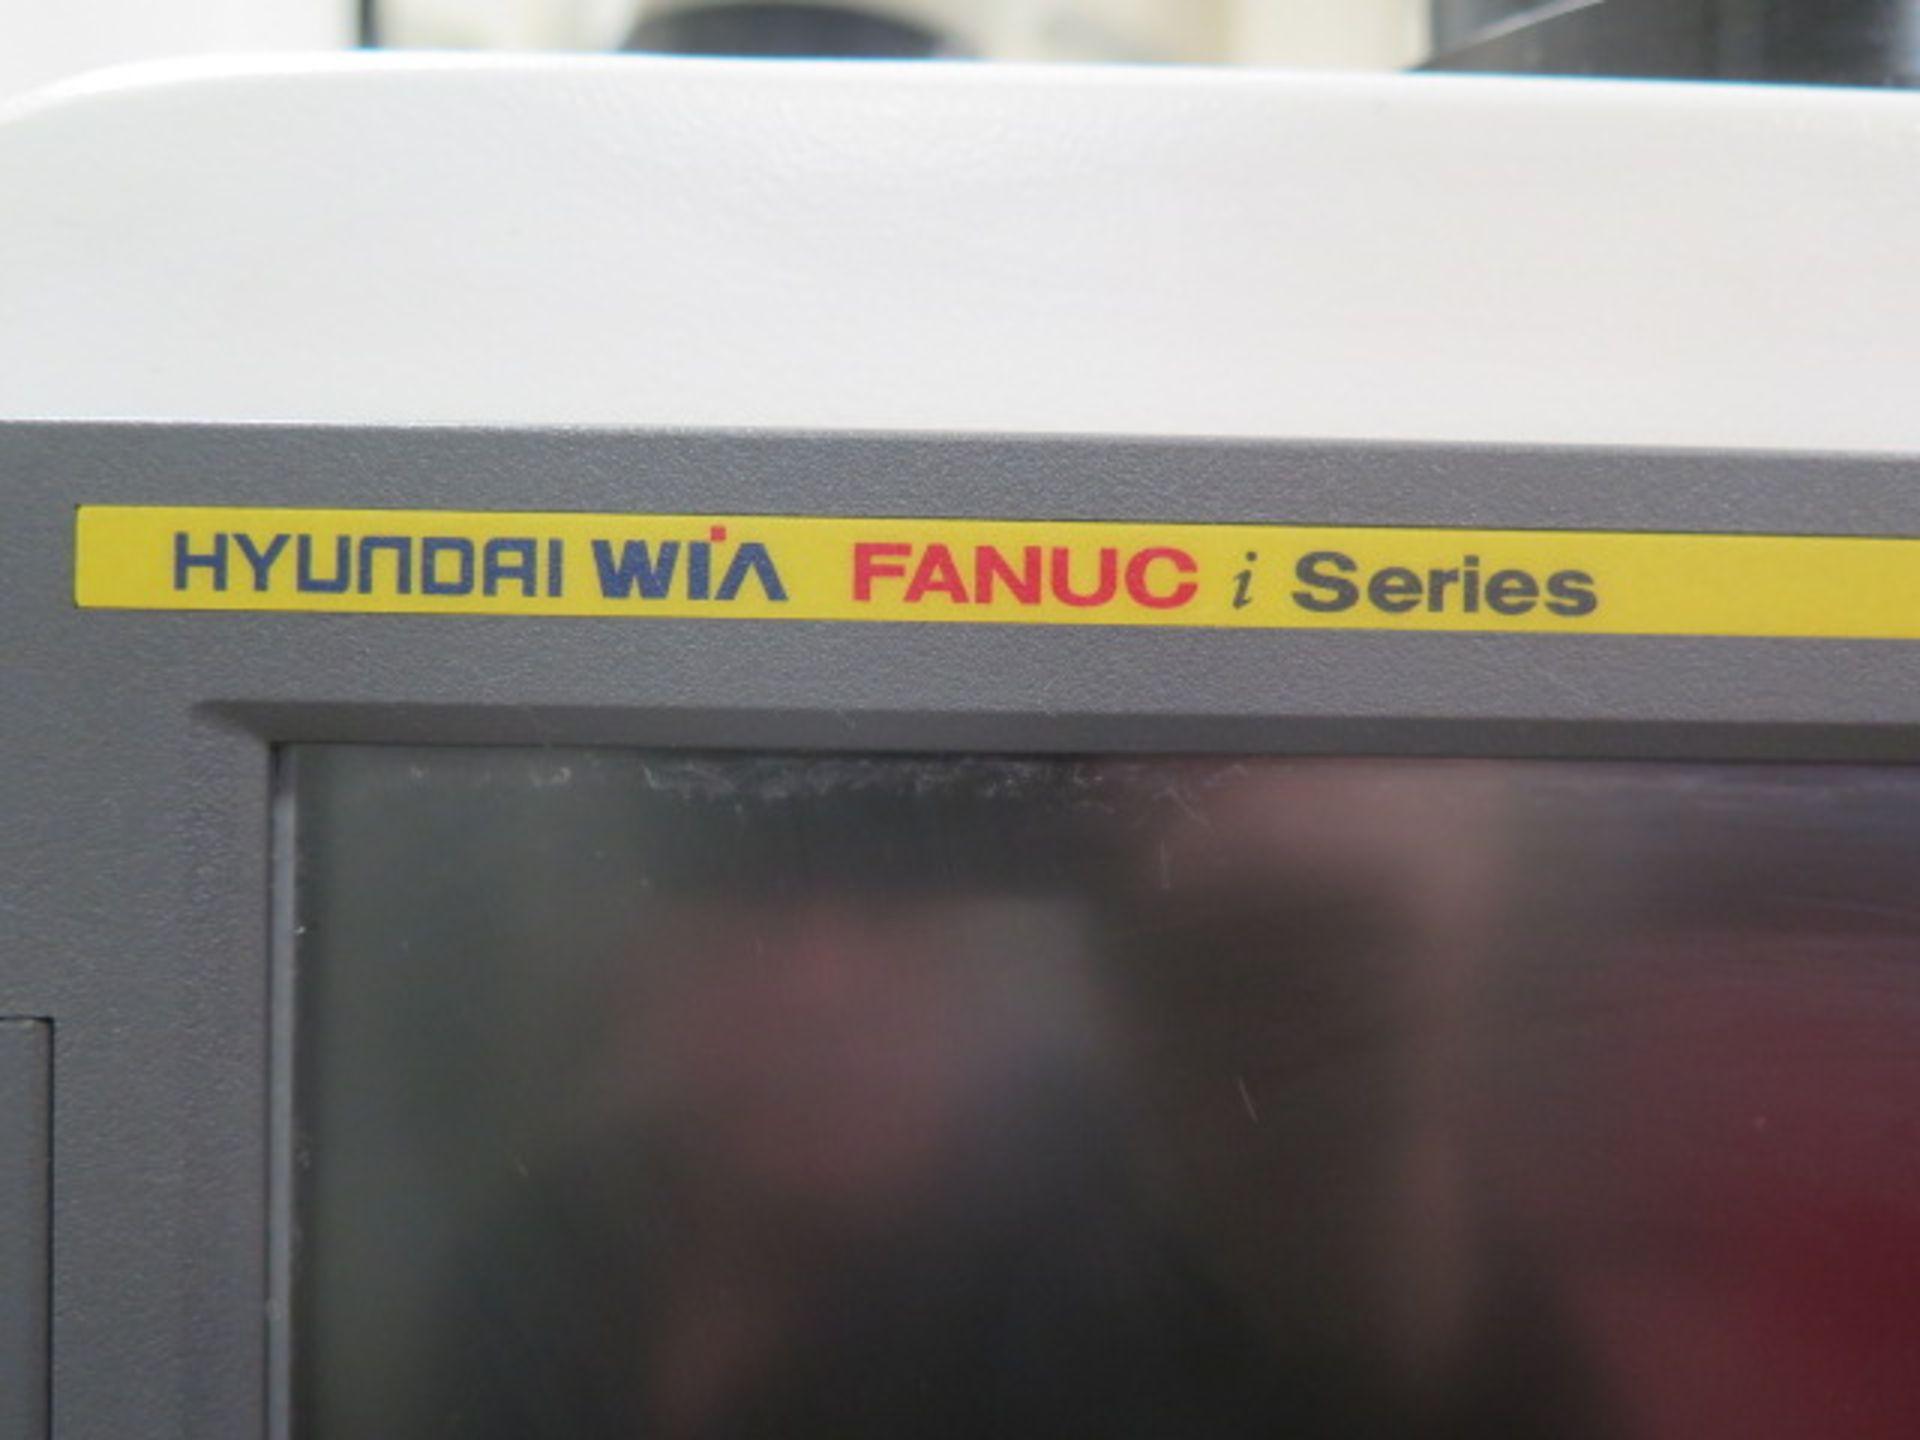 2016 Hyundai WIA F500 4-Axis CNC VMC s/n G3684-3457 w/ Hyundai WIA Fanuc i- Series, SOLD AS IS - Image 7 of 22